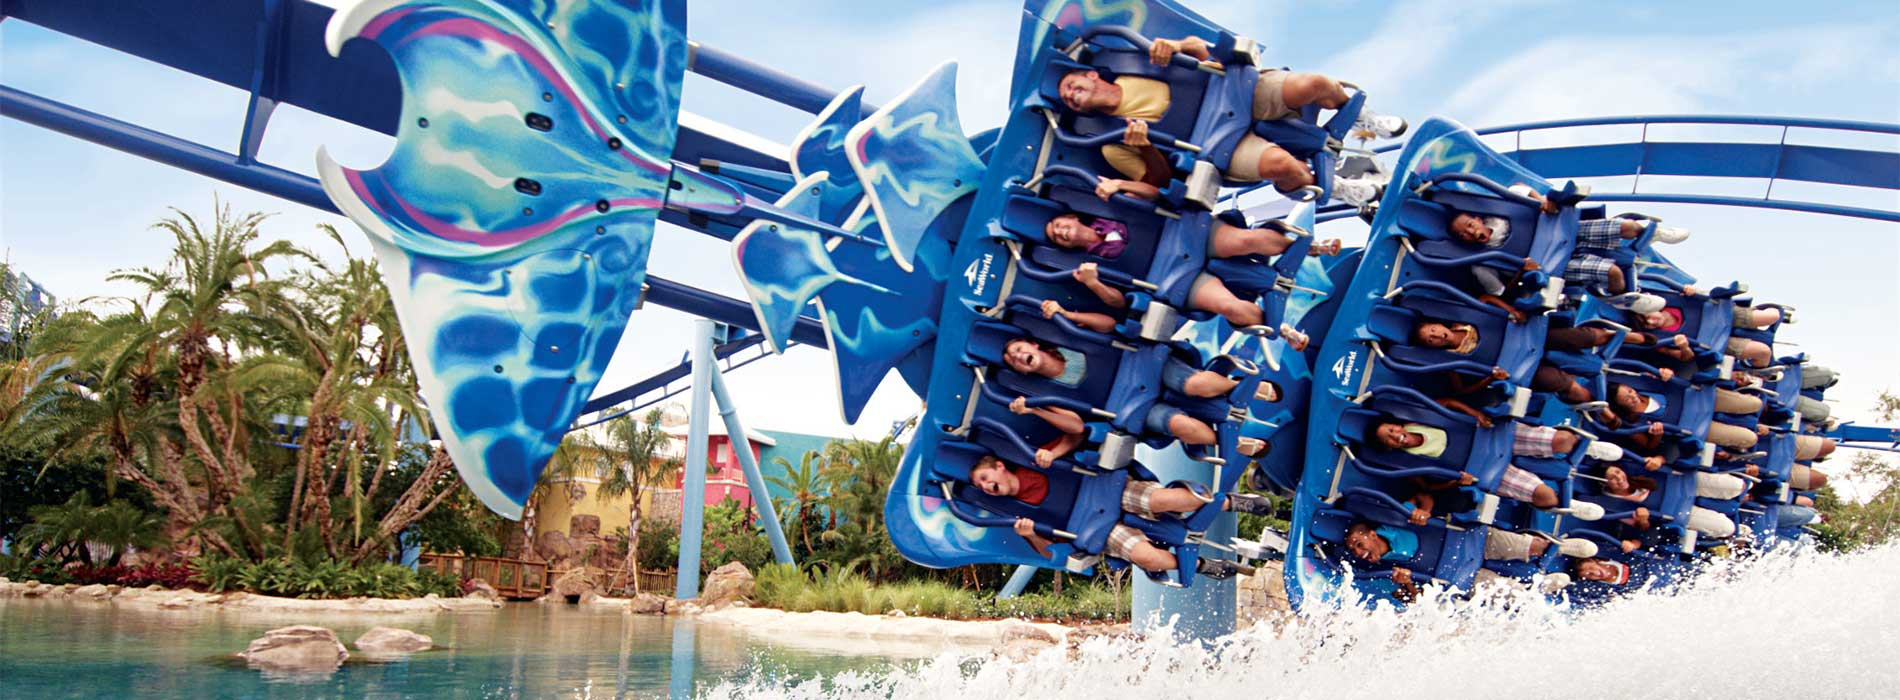 Manta Roller Coaster at SeaWorld Orlando